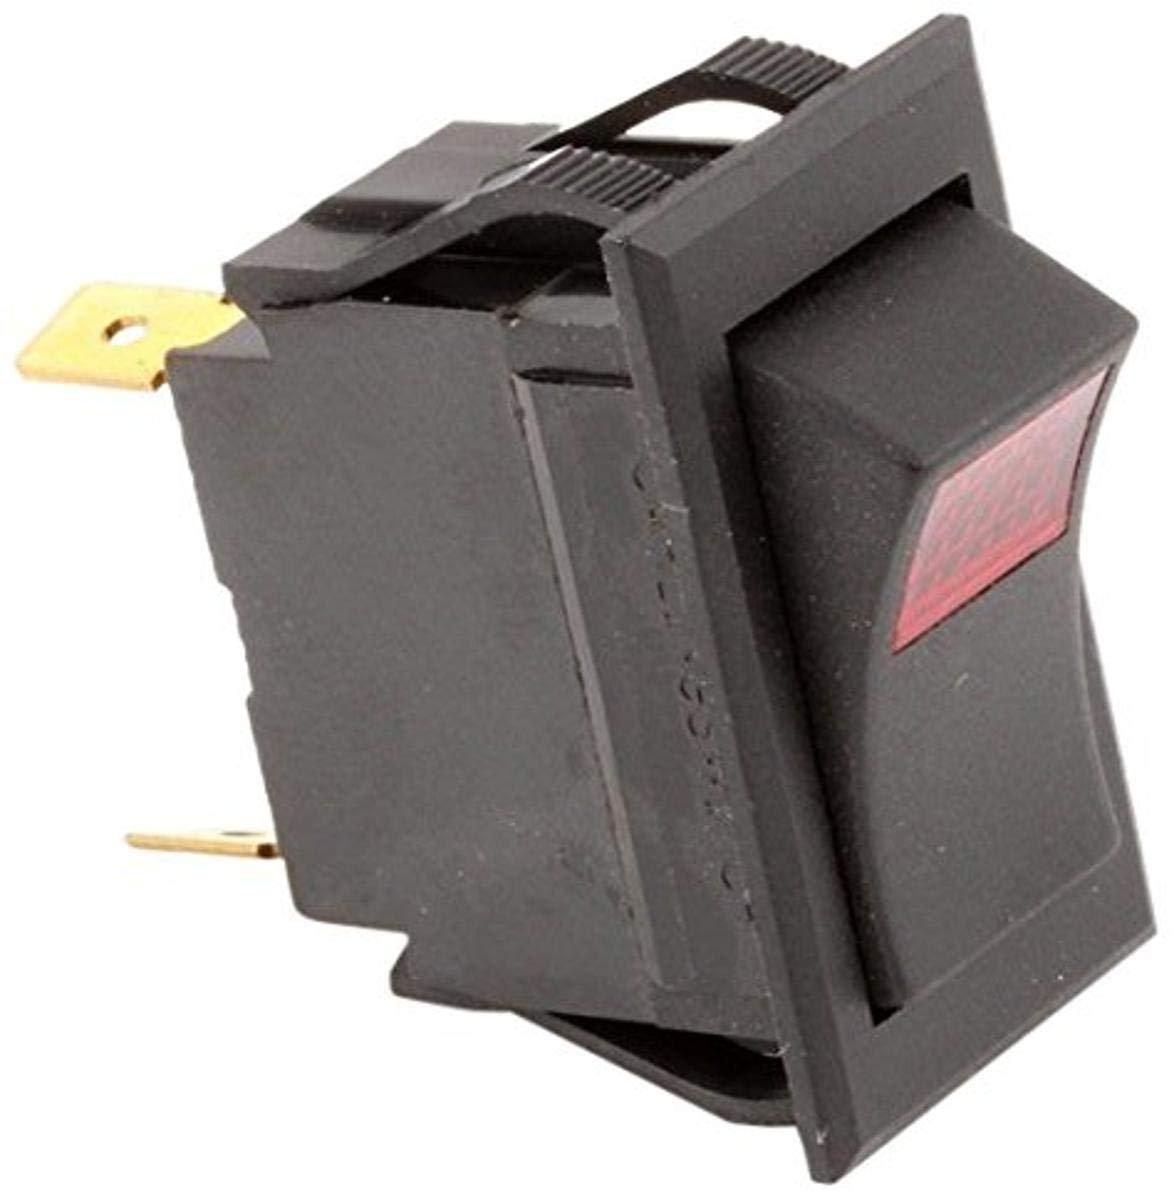 Stero Dishwasher P49-5739 Colorado Springs Mall Rocker Switch Lite Max 67% OFF